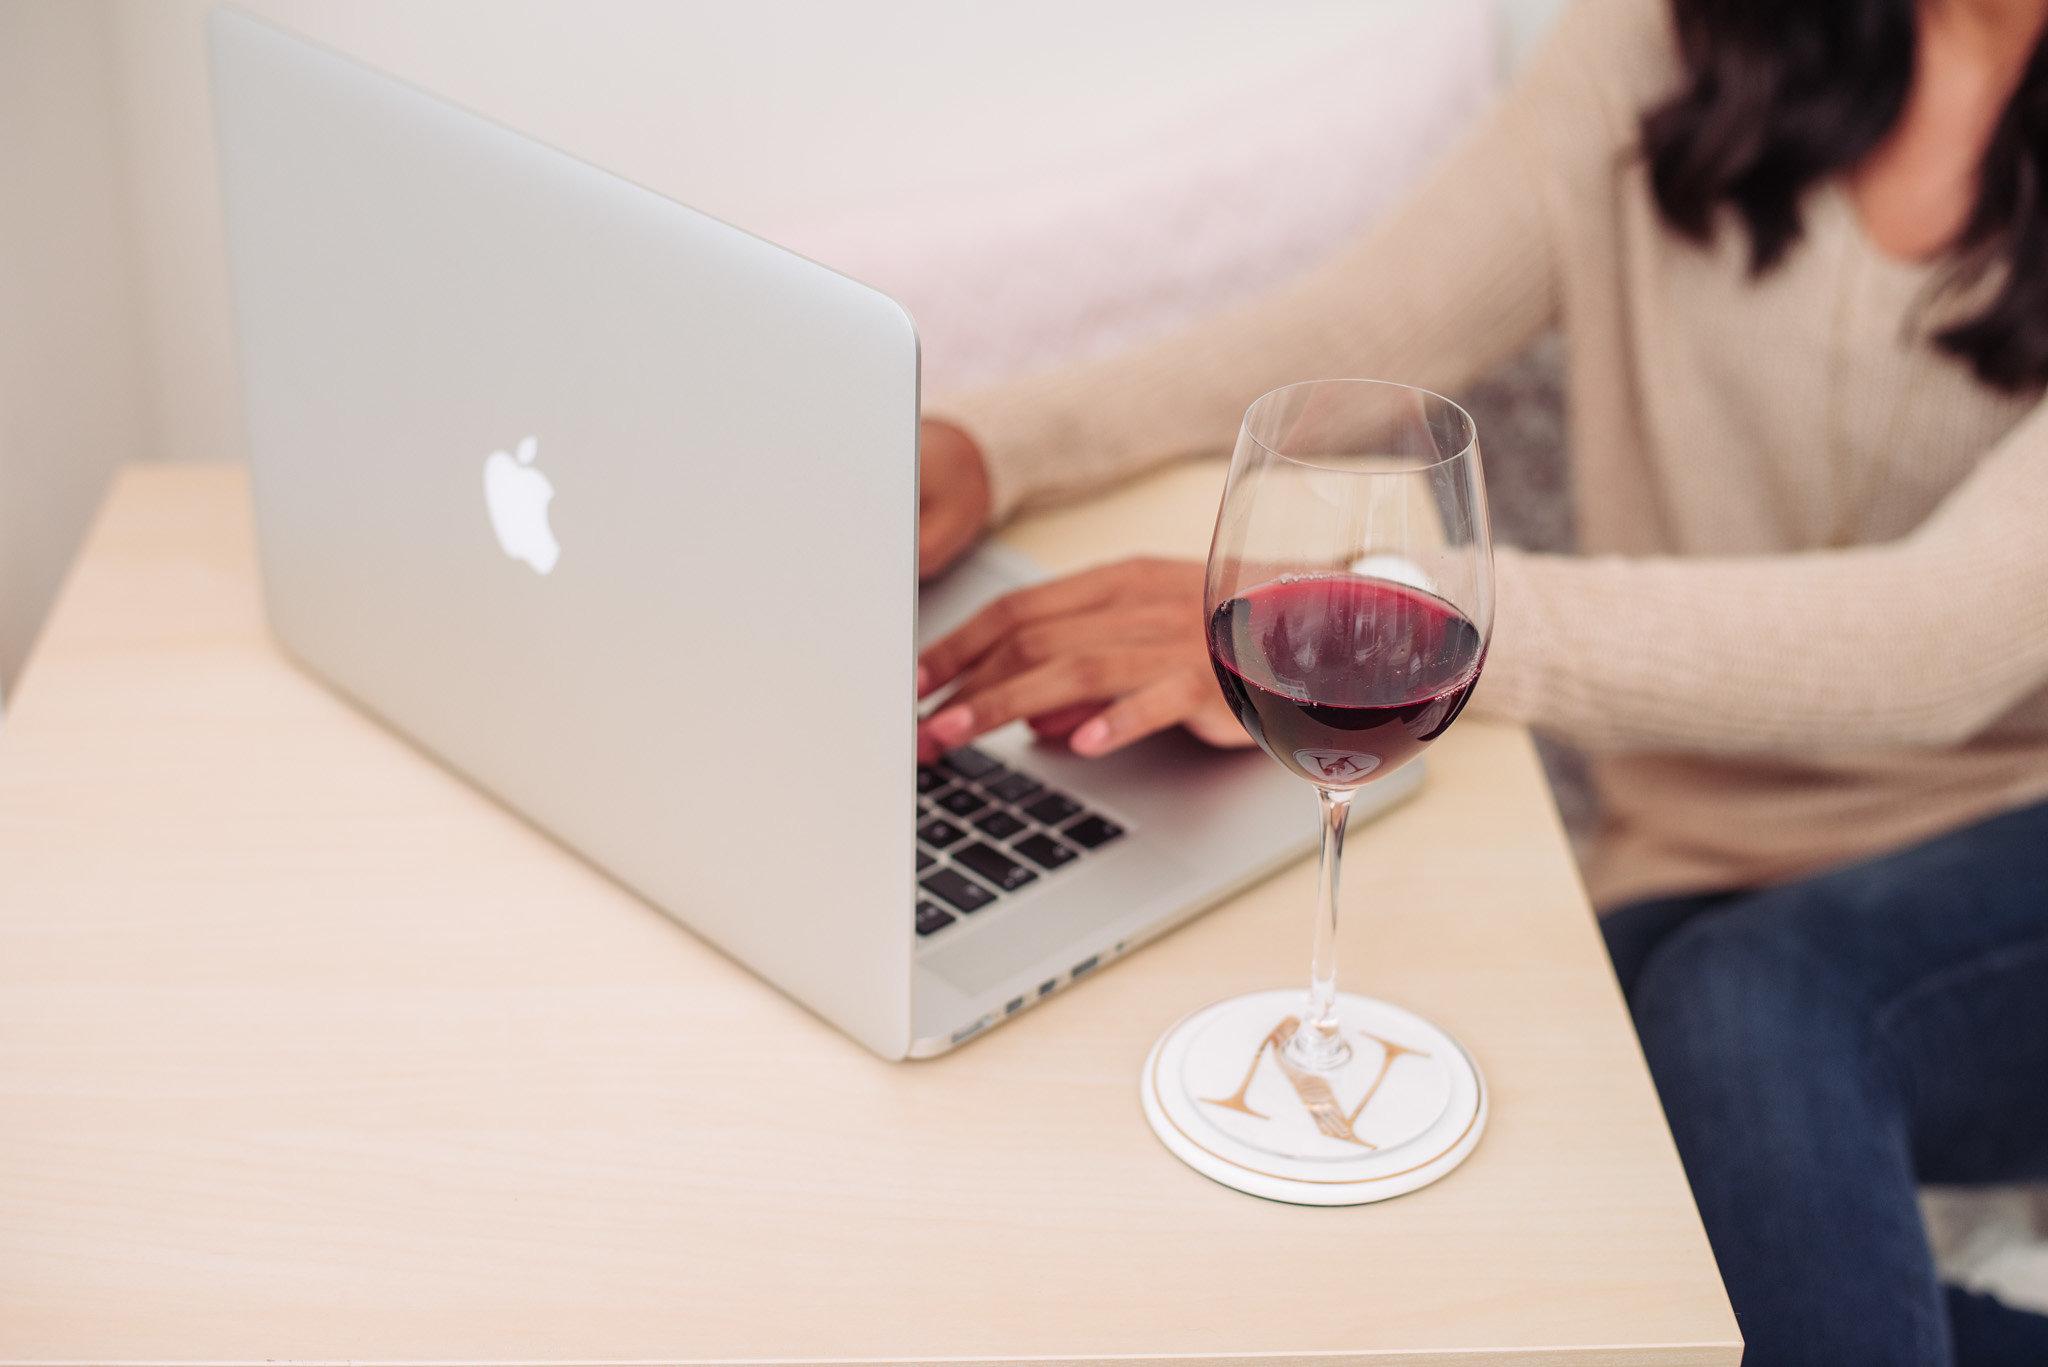 Nesha-Woolery-Business-Mentor-Designers-Web-84.jpg